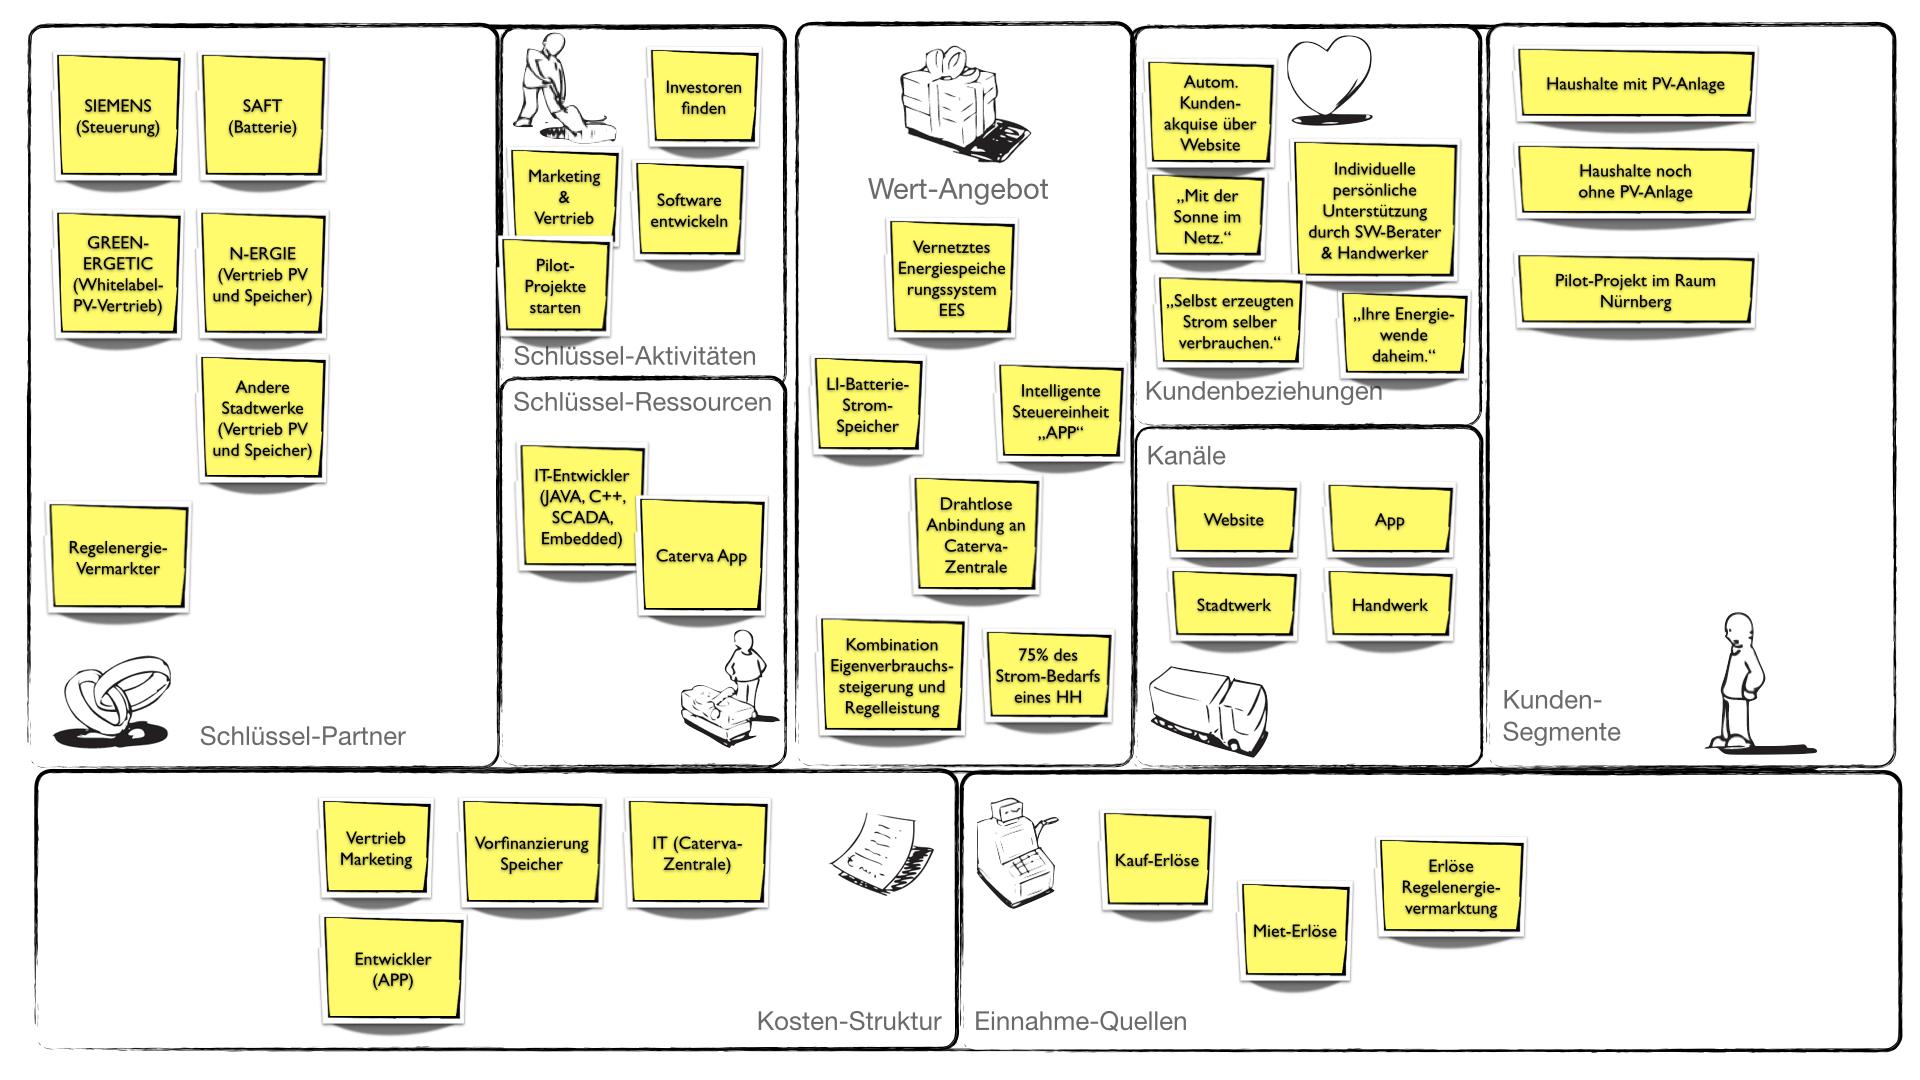 Business-Model der Caterva GmbH